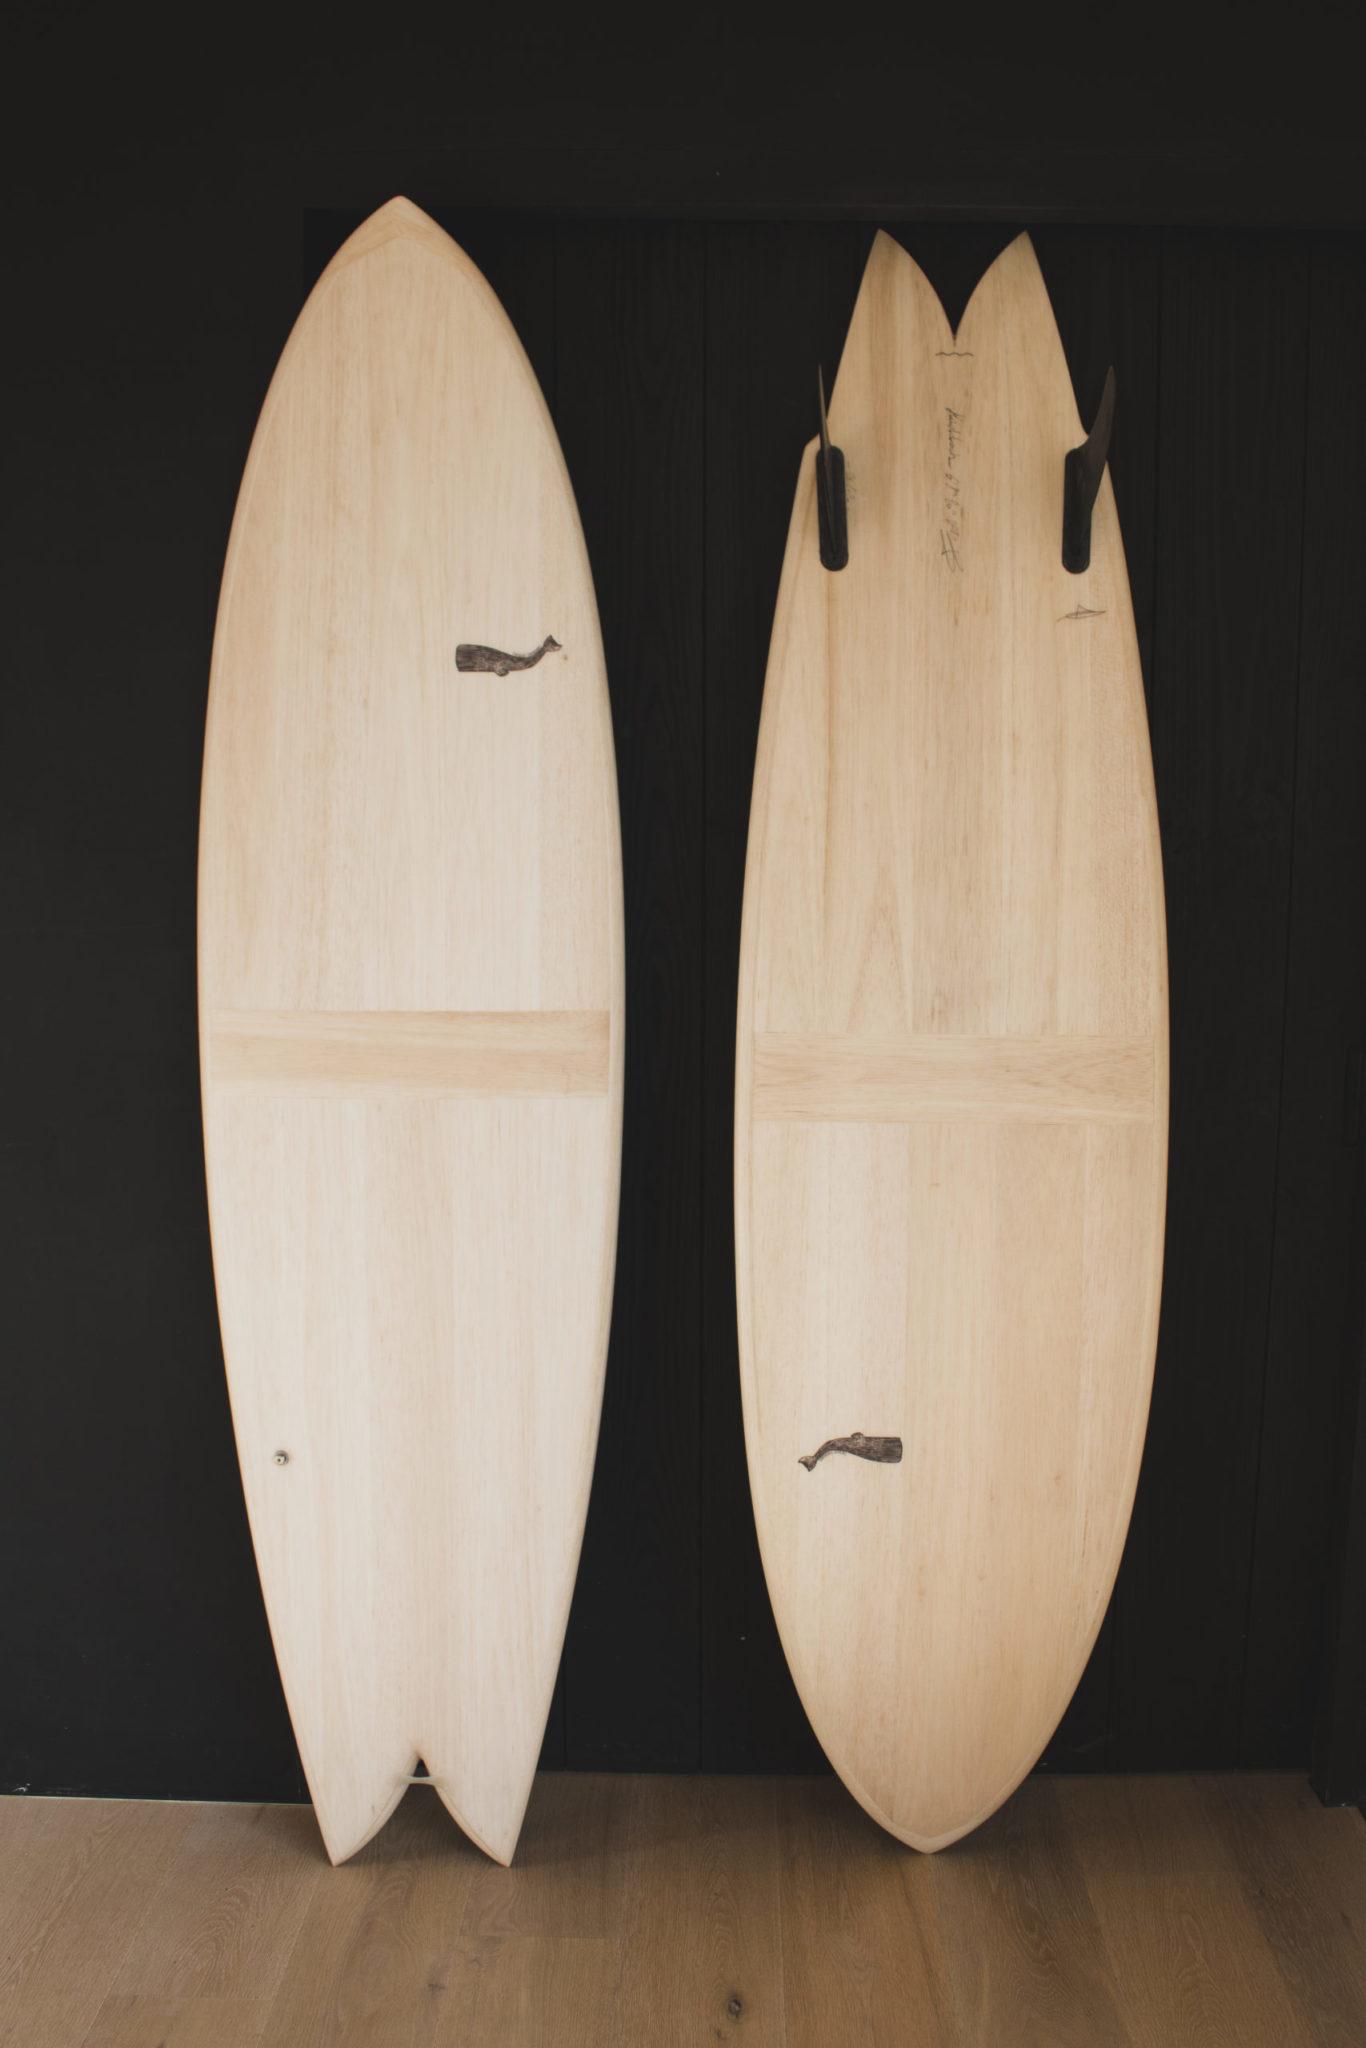 Cachalot Surfboards surfboard artisan surf shaper bois hollow wooden bois mid length haddock